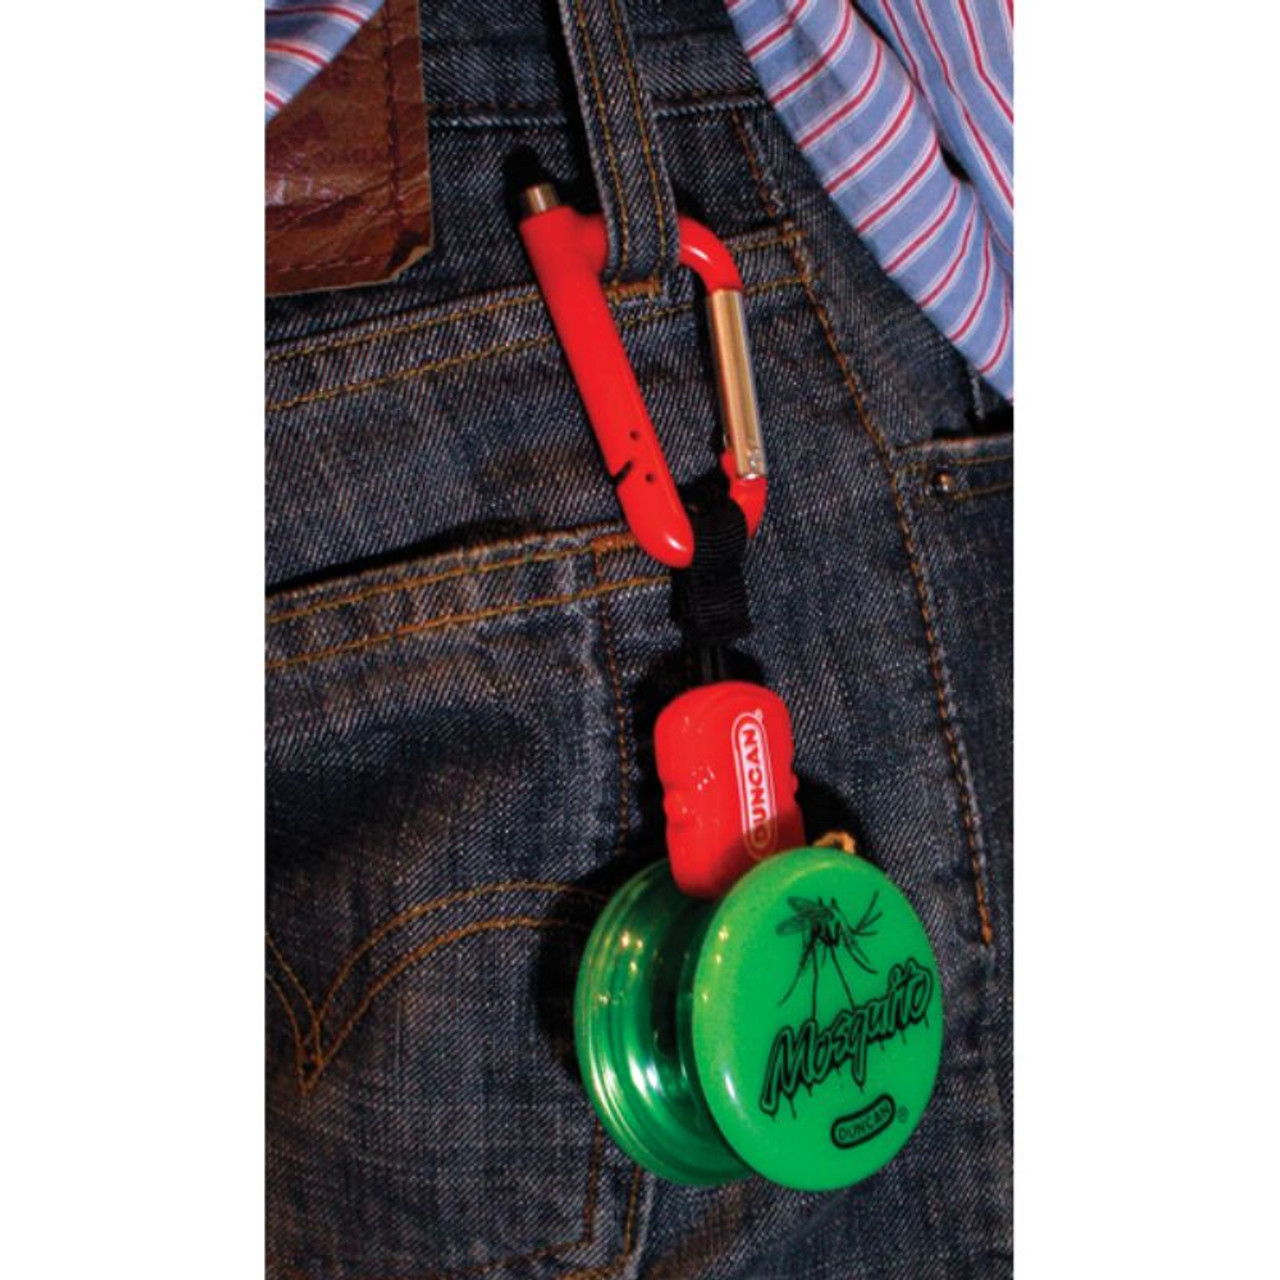 String Cutter /& Bearing Removal Tool Duncan Toys Yo-Tility Yo yo Holster